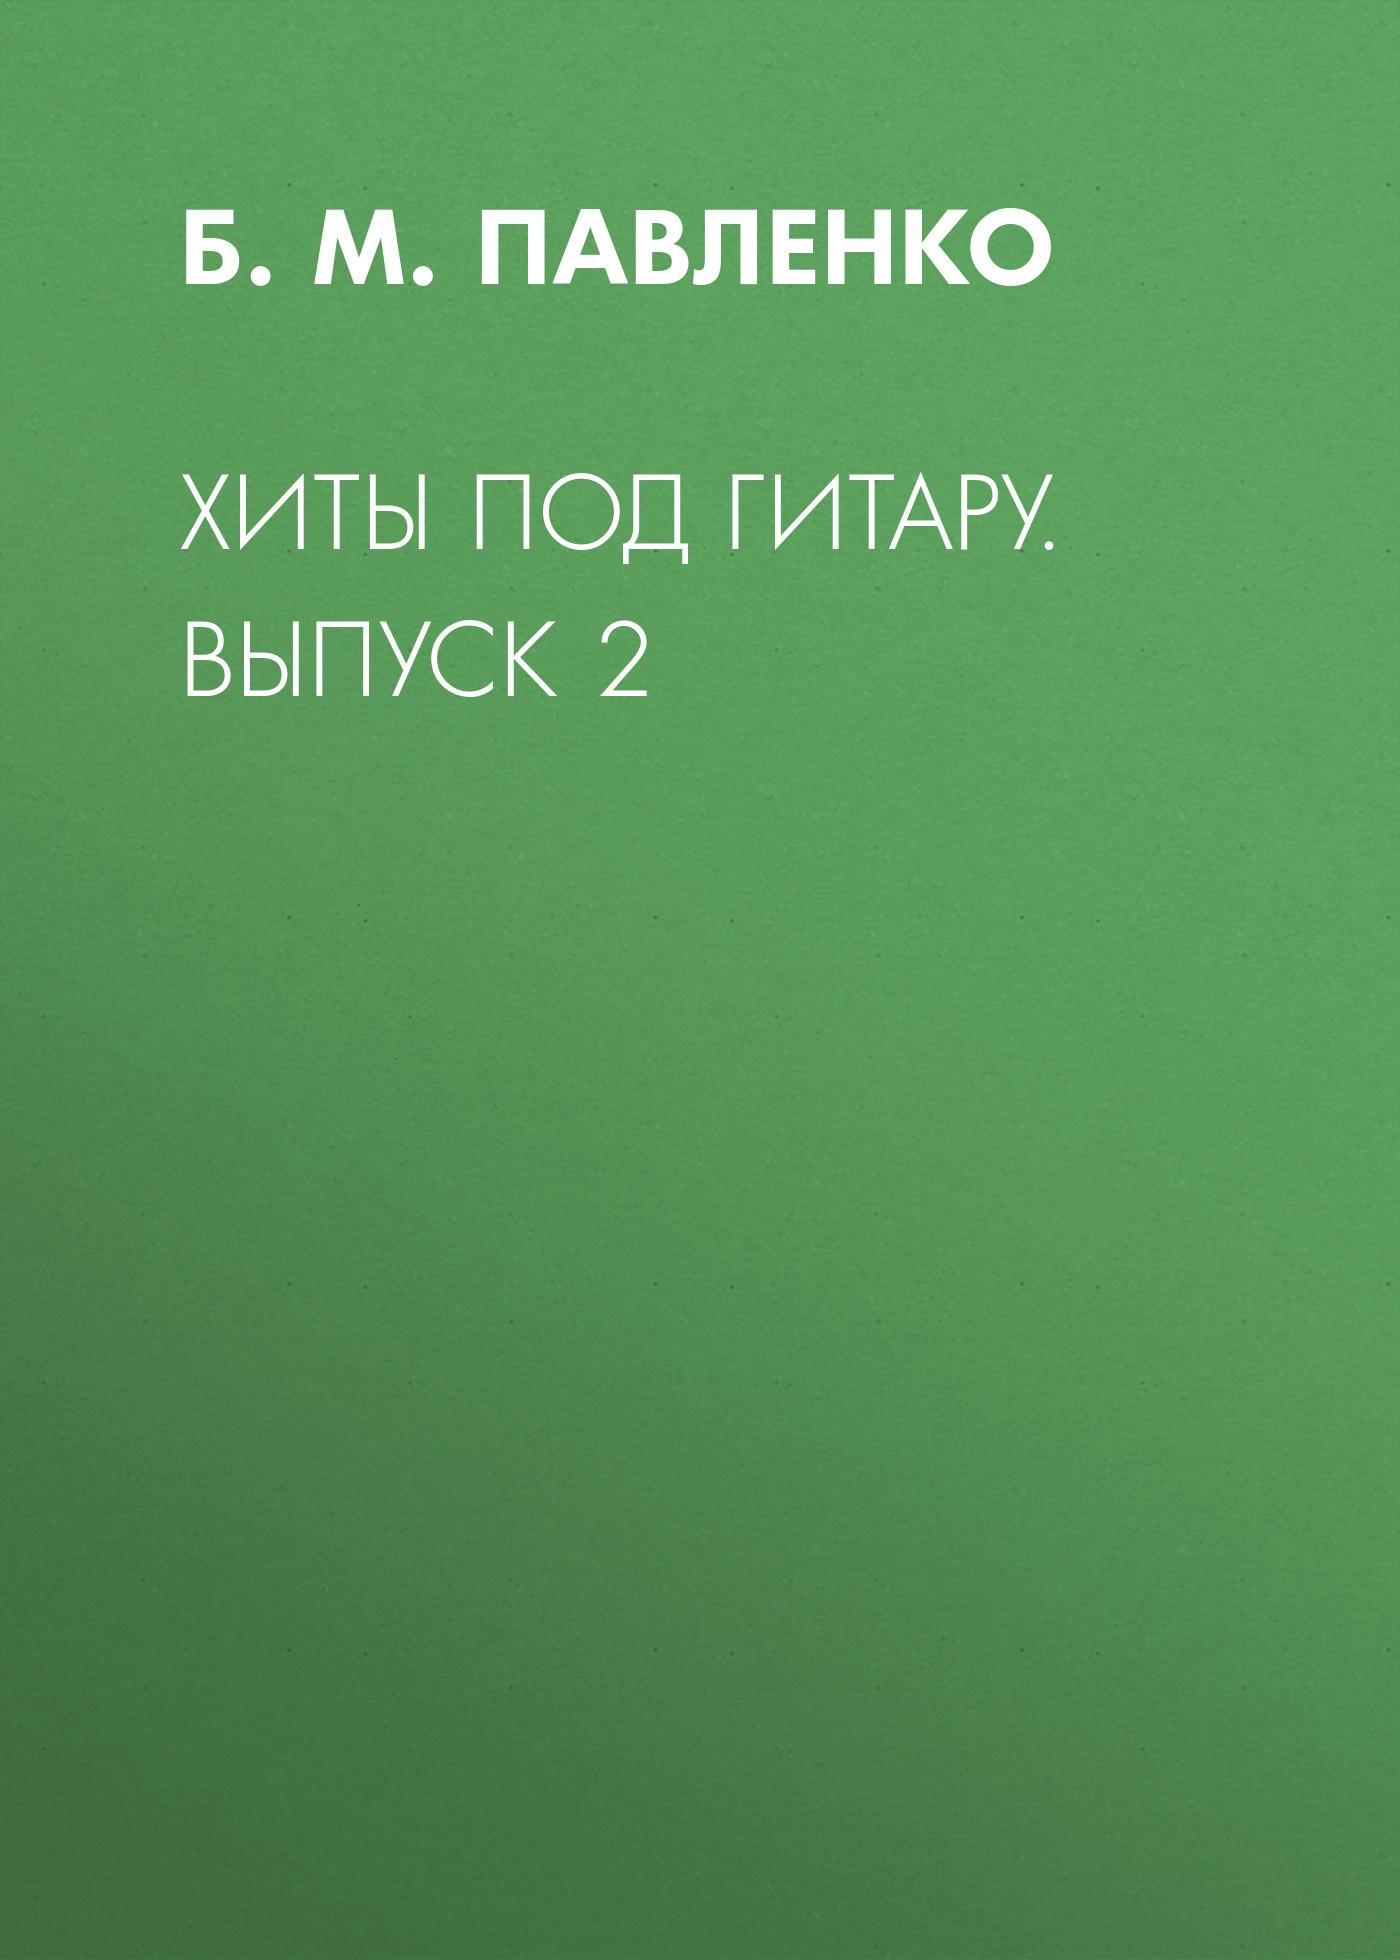 Б. М. Павленко Хиты под гитару. Выпуск 2 б м павленко хиты под гитару выпуск 1